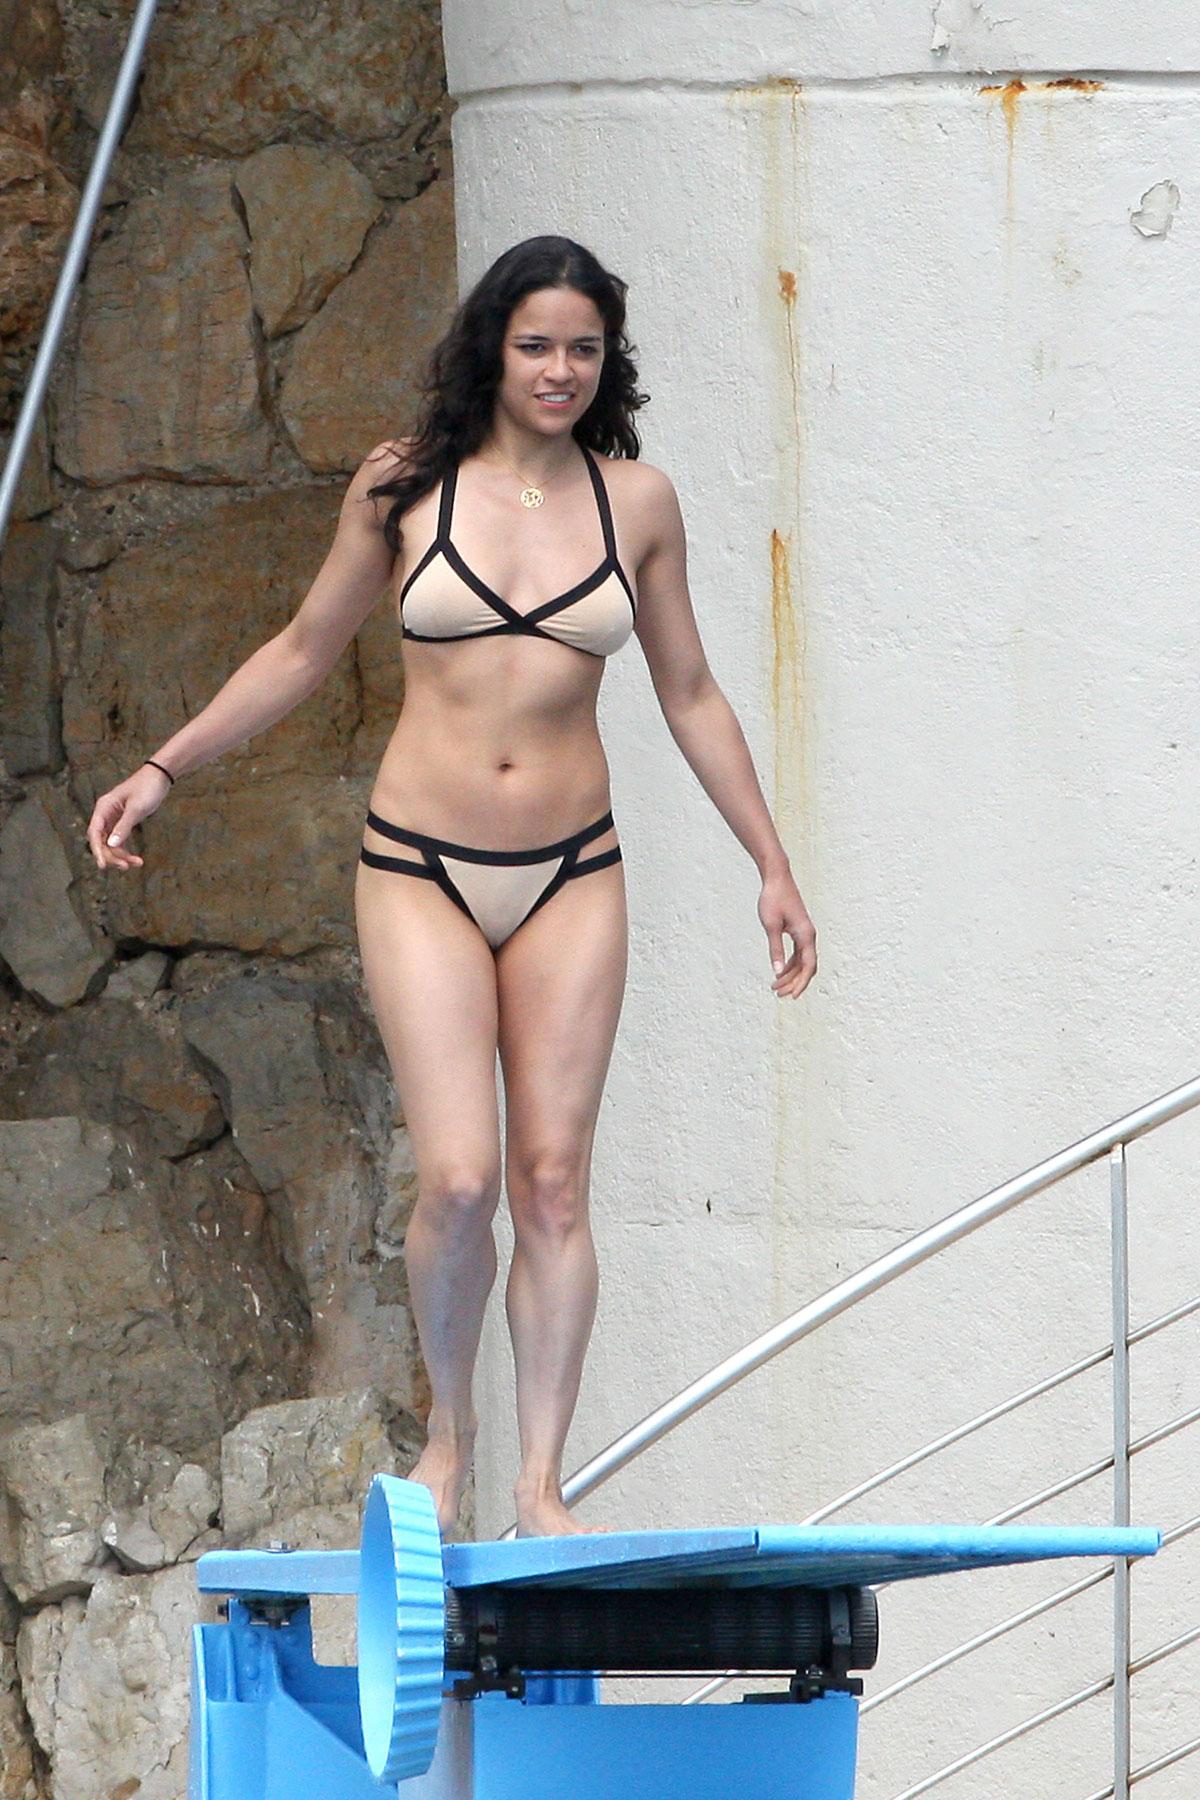 Michelle Rodriguez Bikini Bodies Pic 26 of 35